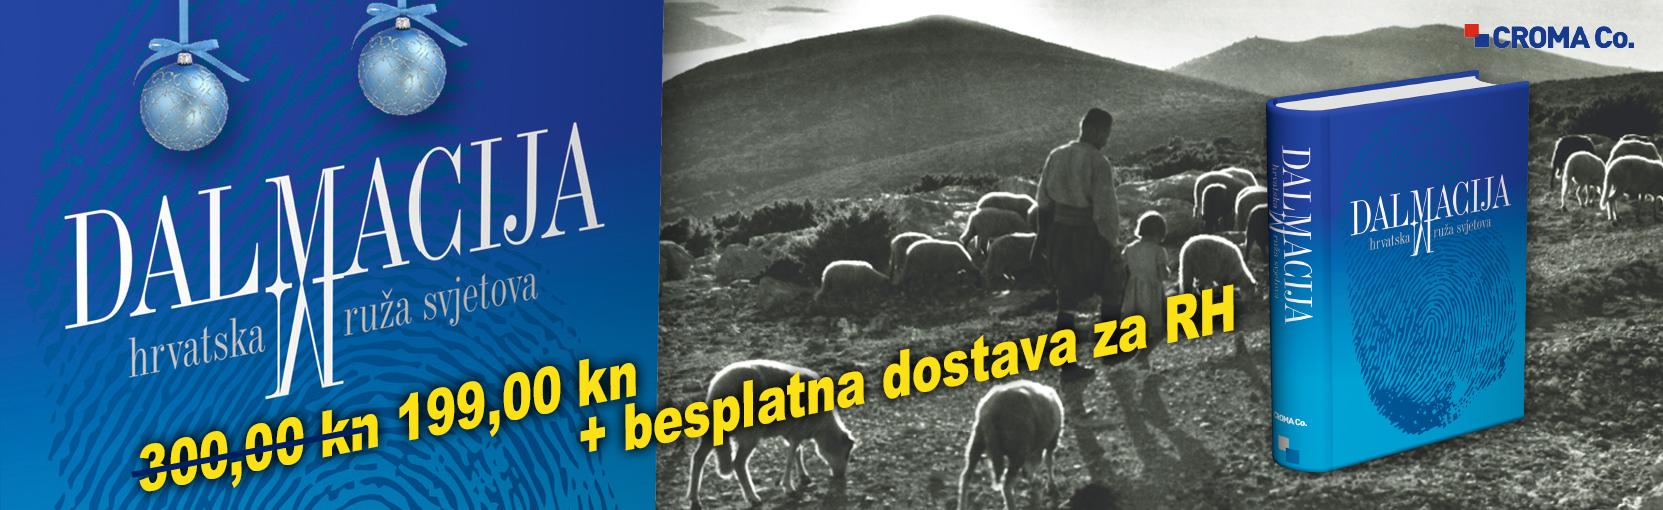 croma-ZA-WEB-1663-510